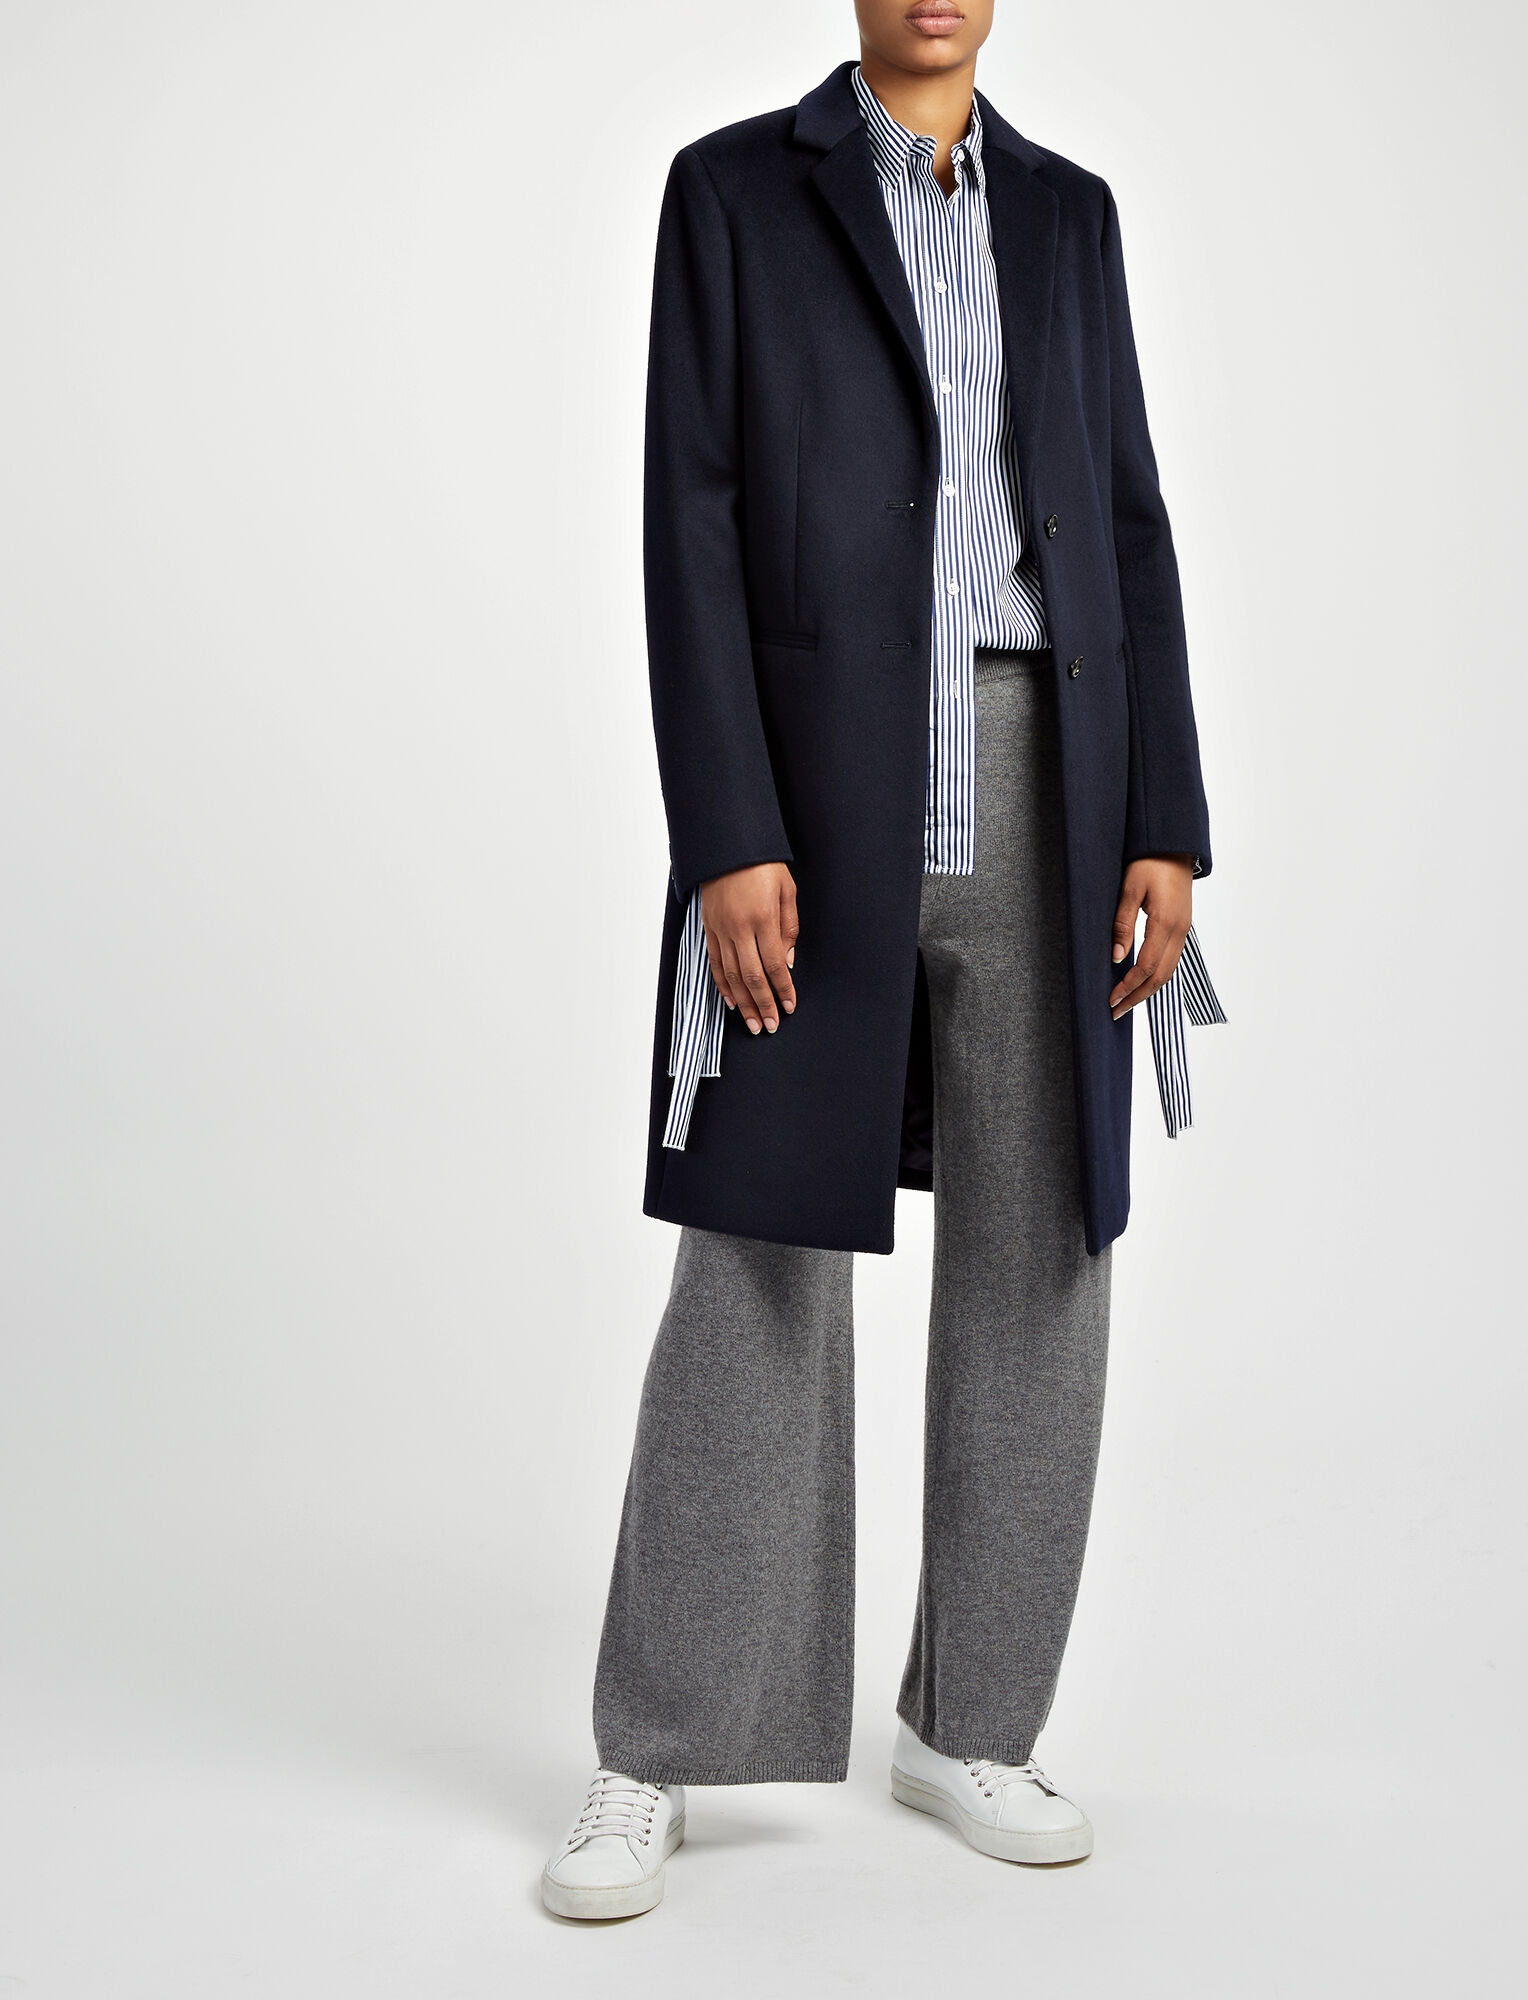 Joseph, New Wool Martin Coat, in NAVY